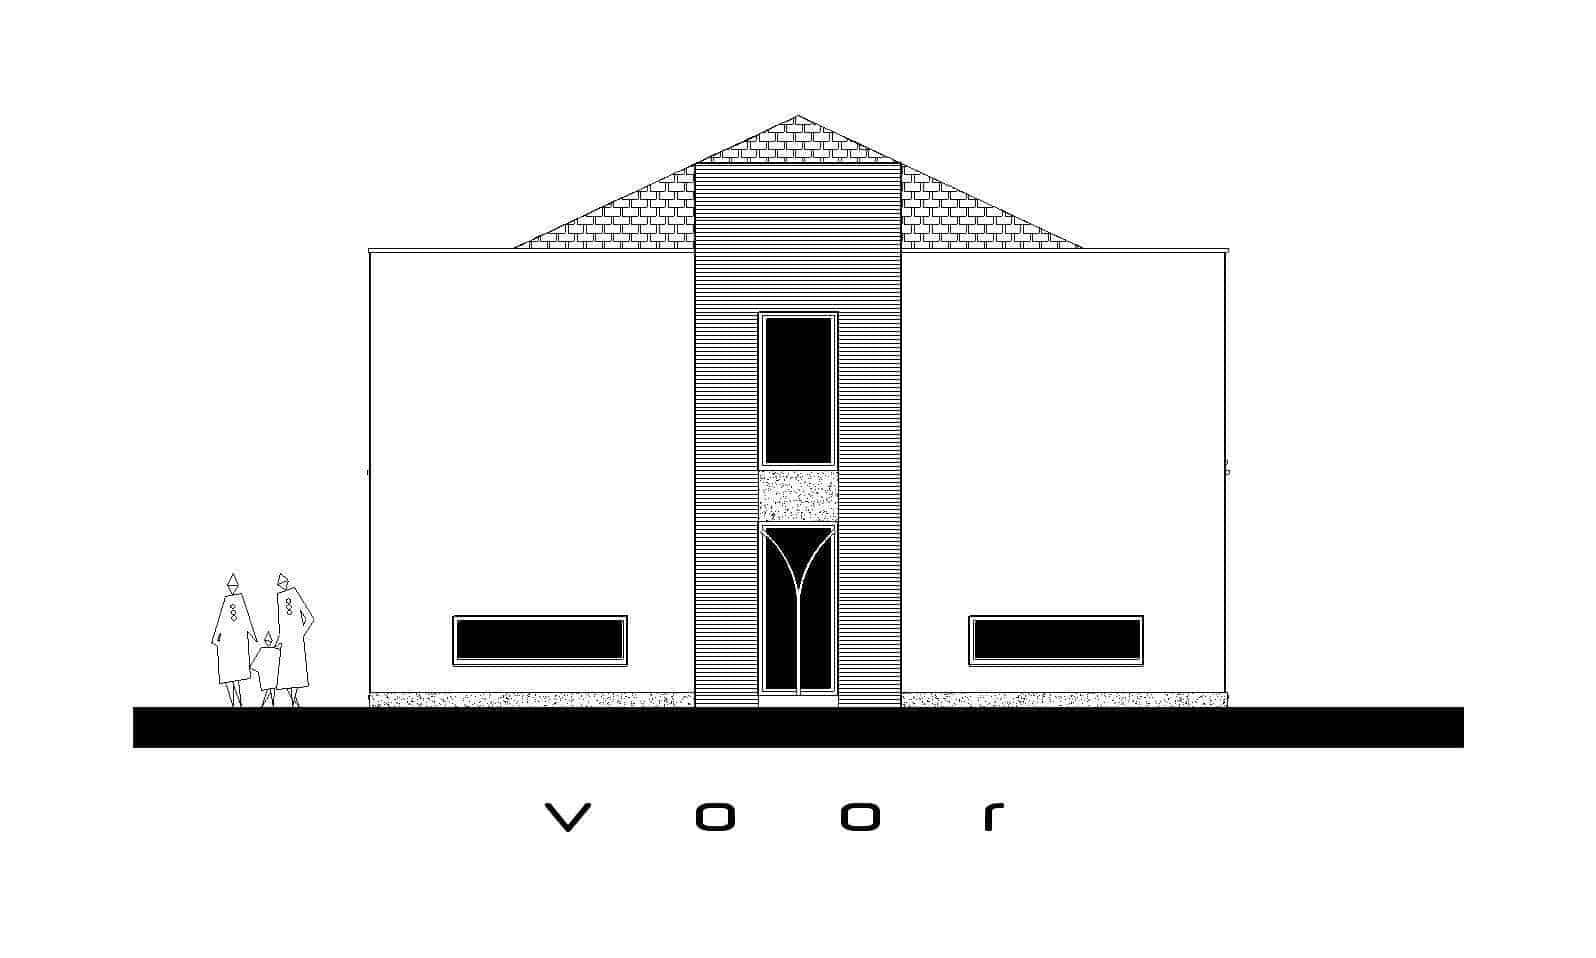 Detail afbeelding 5 van R & W   –   Strakke Accent Woning   –   Rekem | Ontwerp door architect Patrick Strackx